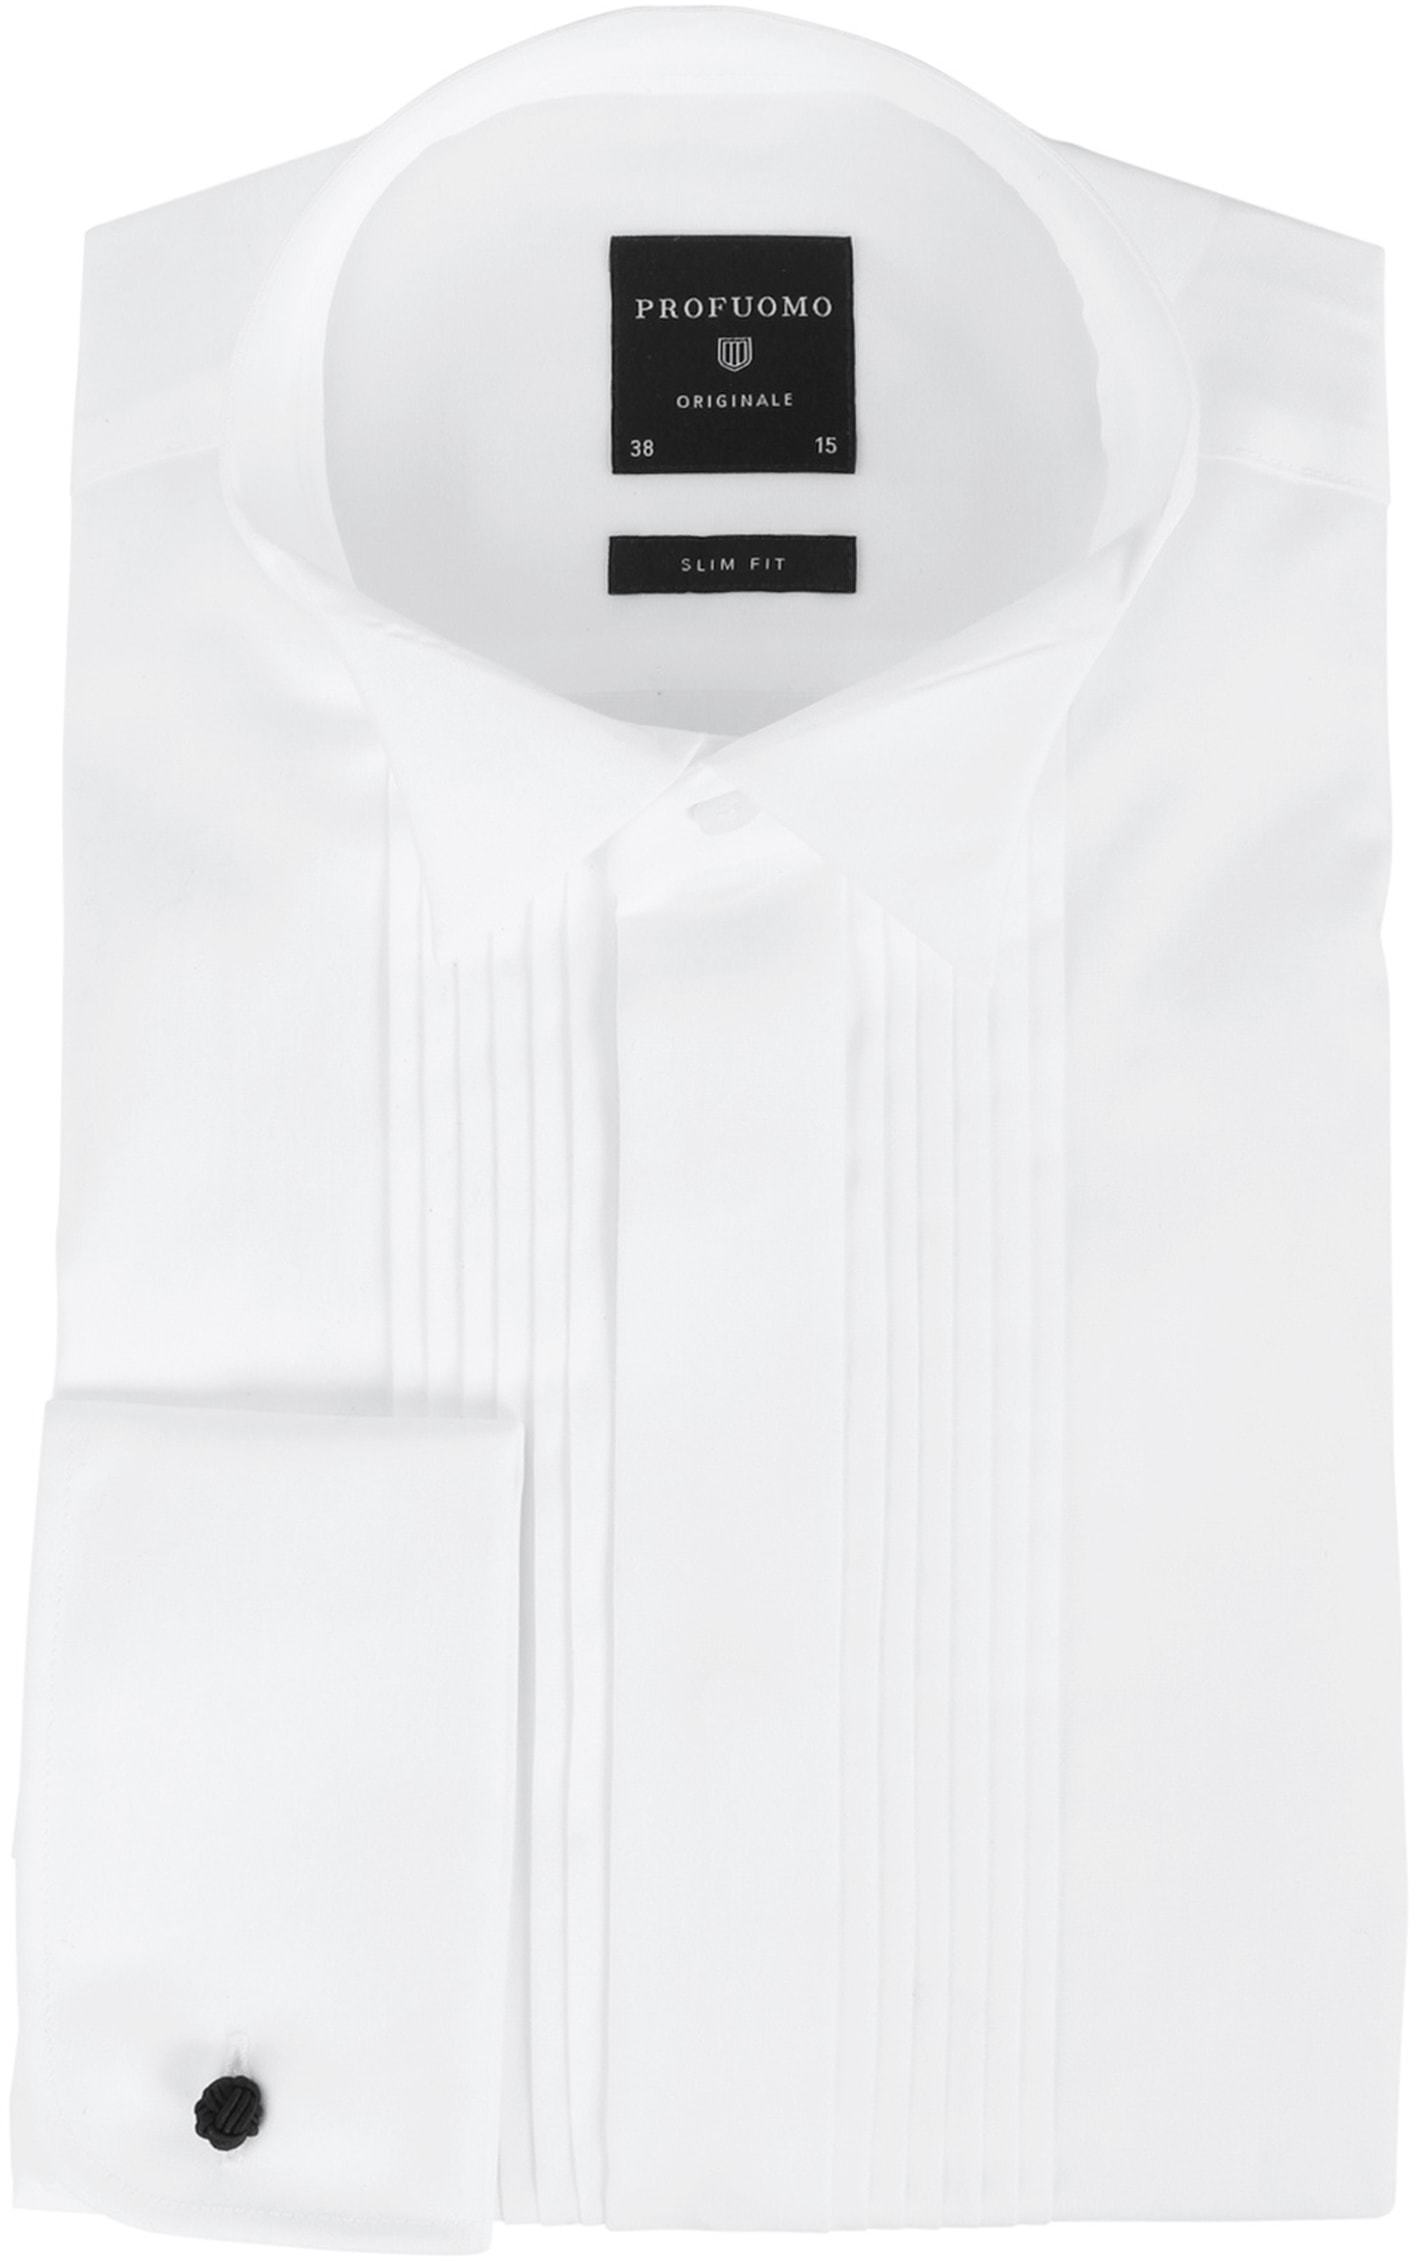 Profuomo Smoking Hemd Plissiert Slim Fit Weiß foto 0